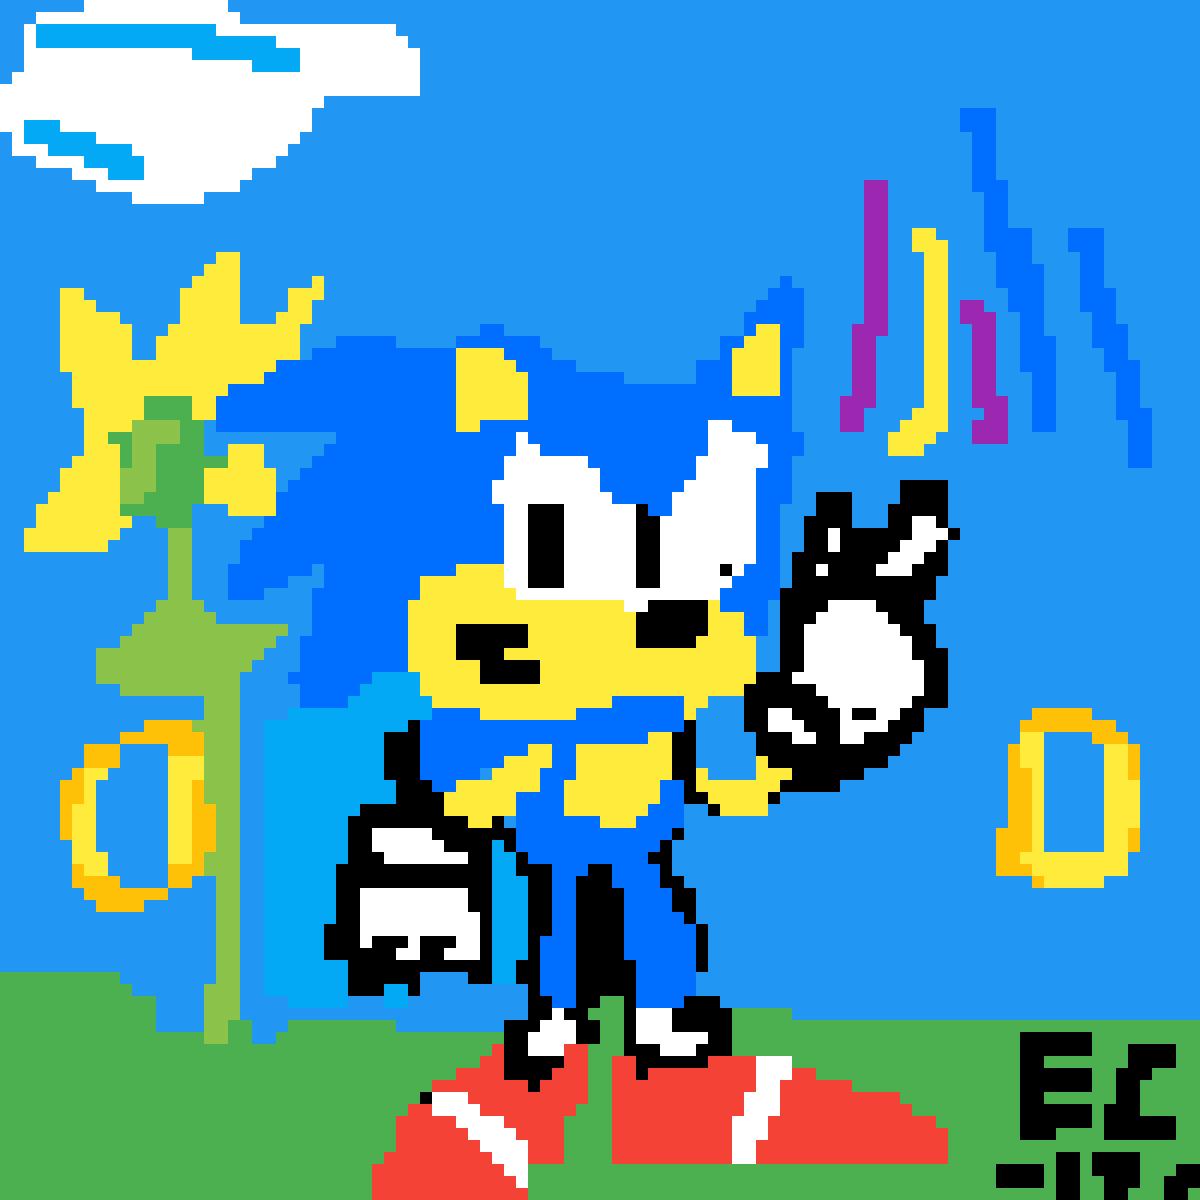 Pixilart 8 Bit Sonic The Hedgehog Pixel Art By Anonymous